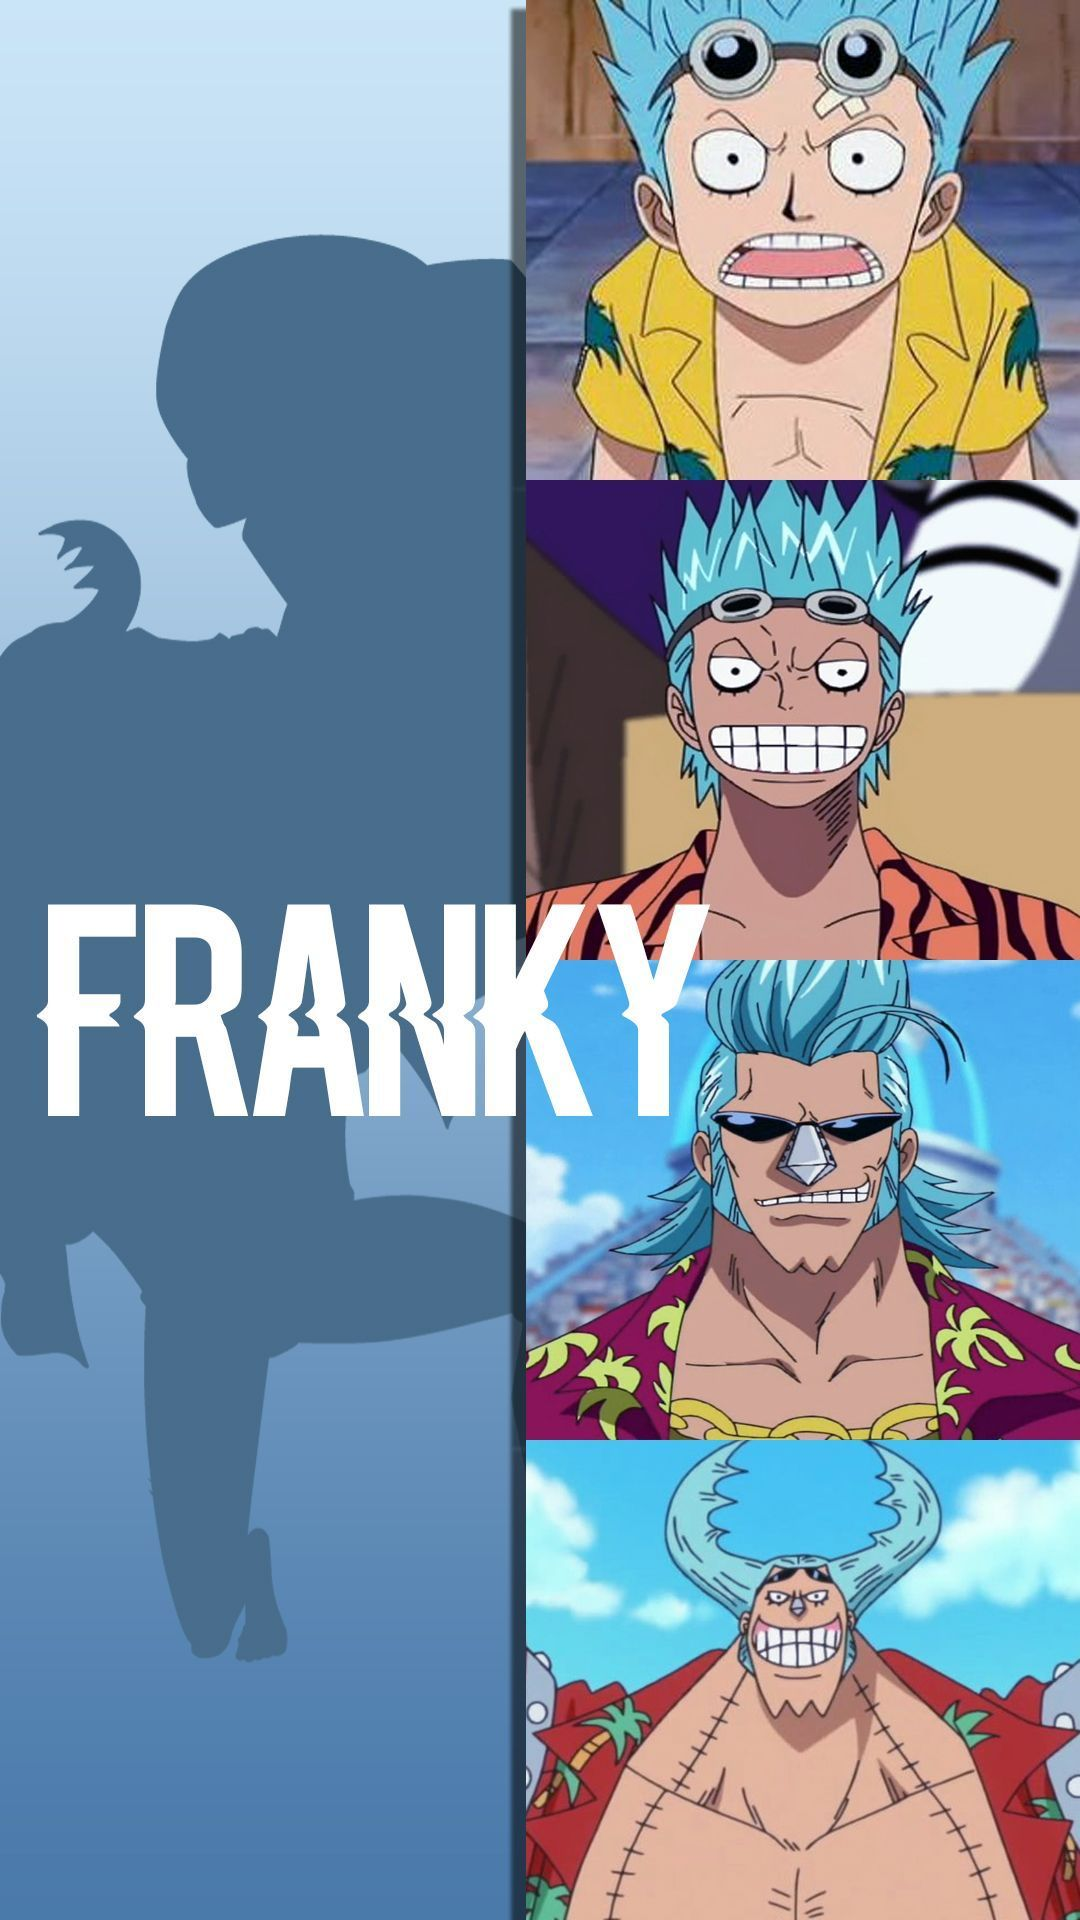 Fondos De Rick Y Morty Gravity Falls Y Steven Universe Comics One Piece Images One Piece Anime One Piece Manga